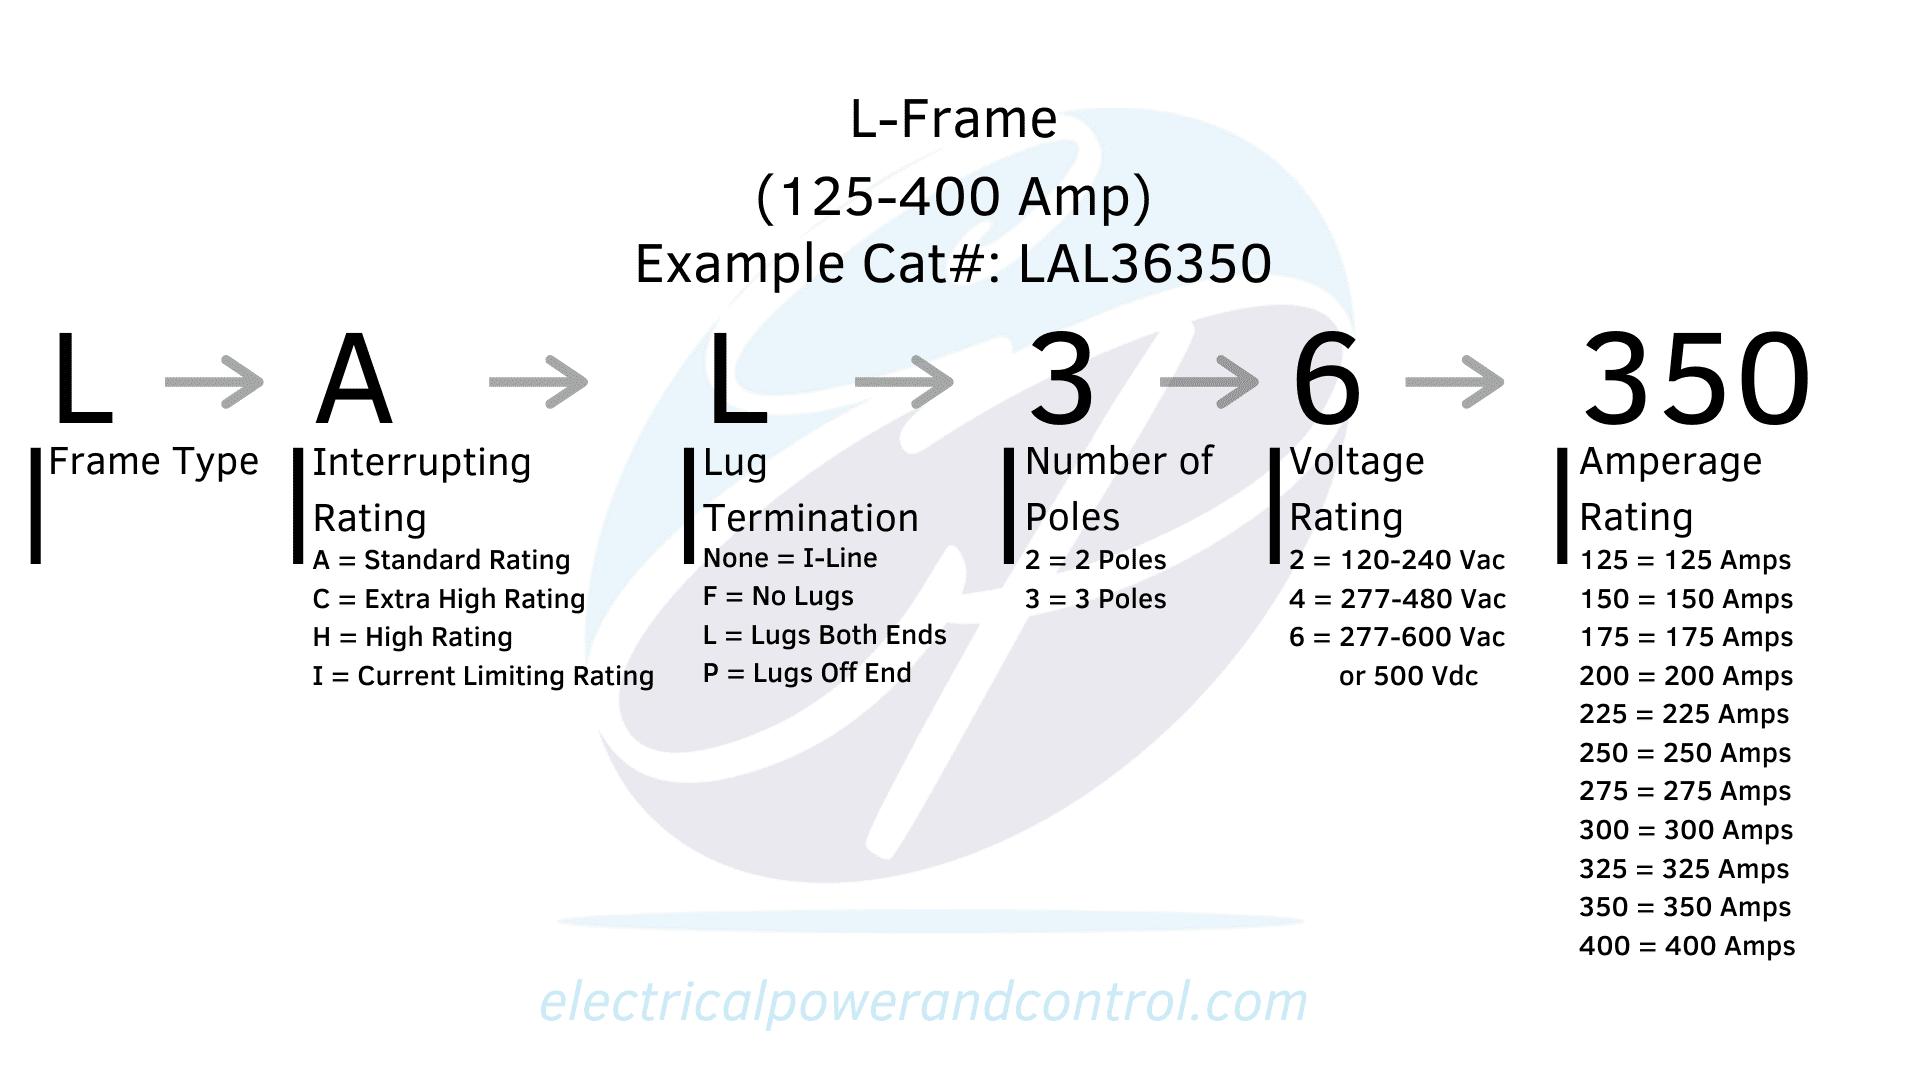 L-Frame Chart/Diagram